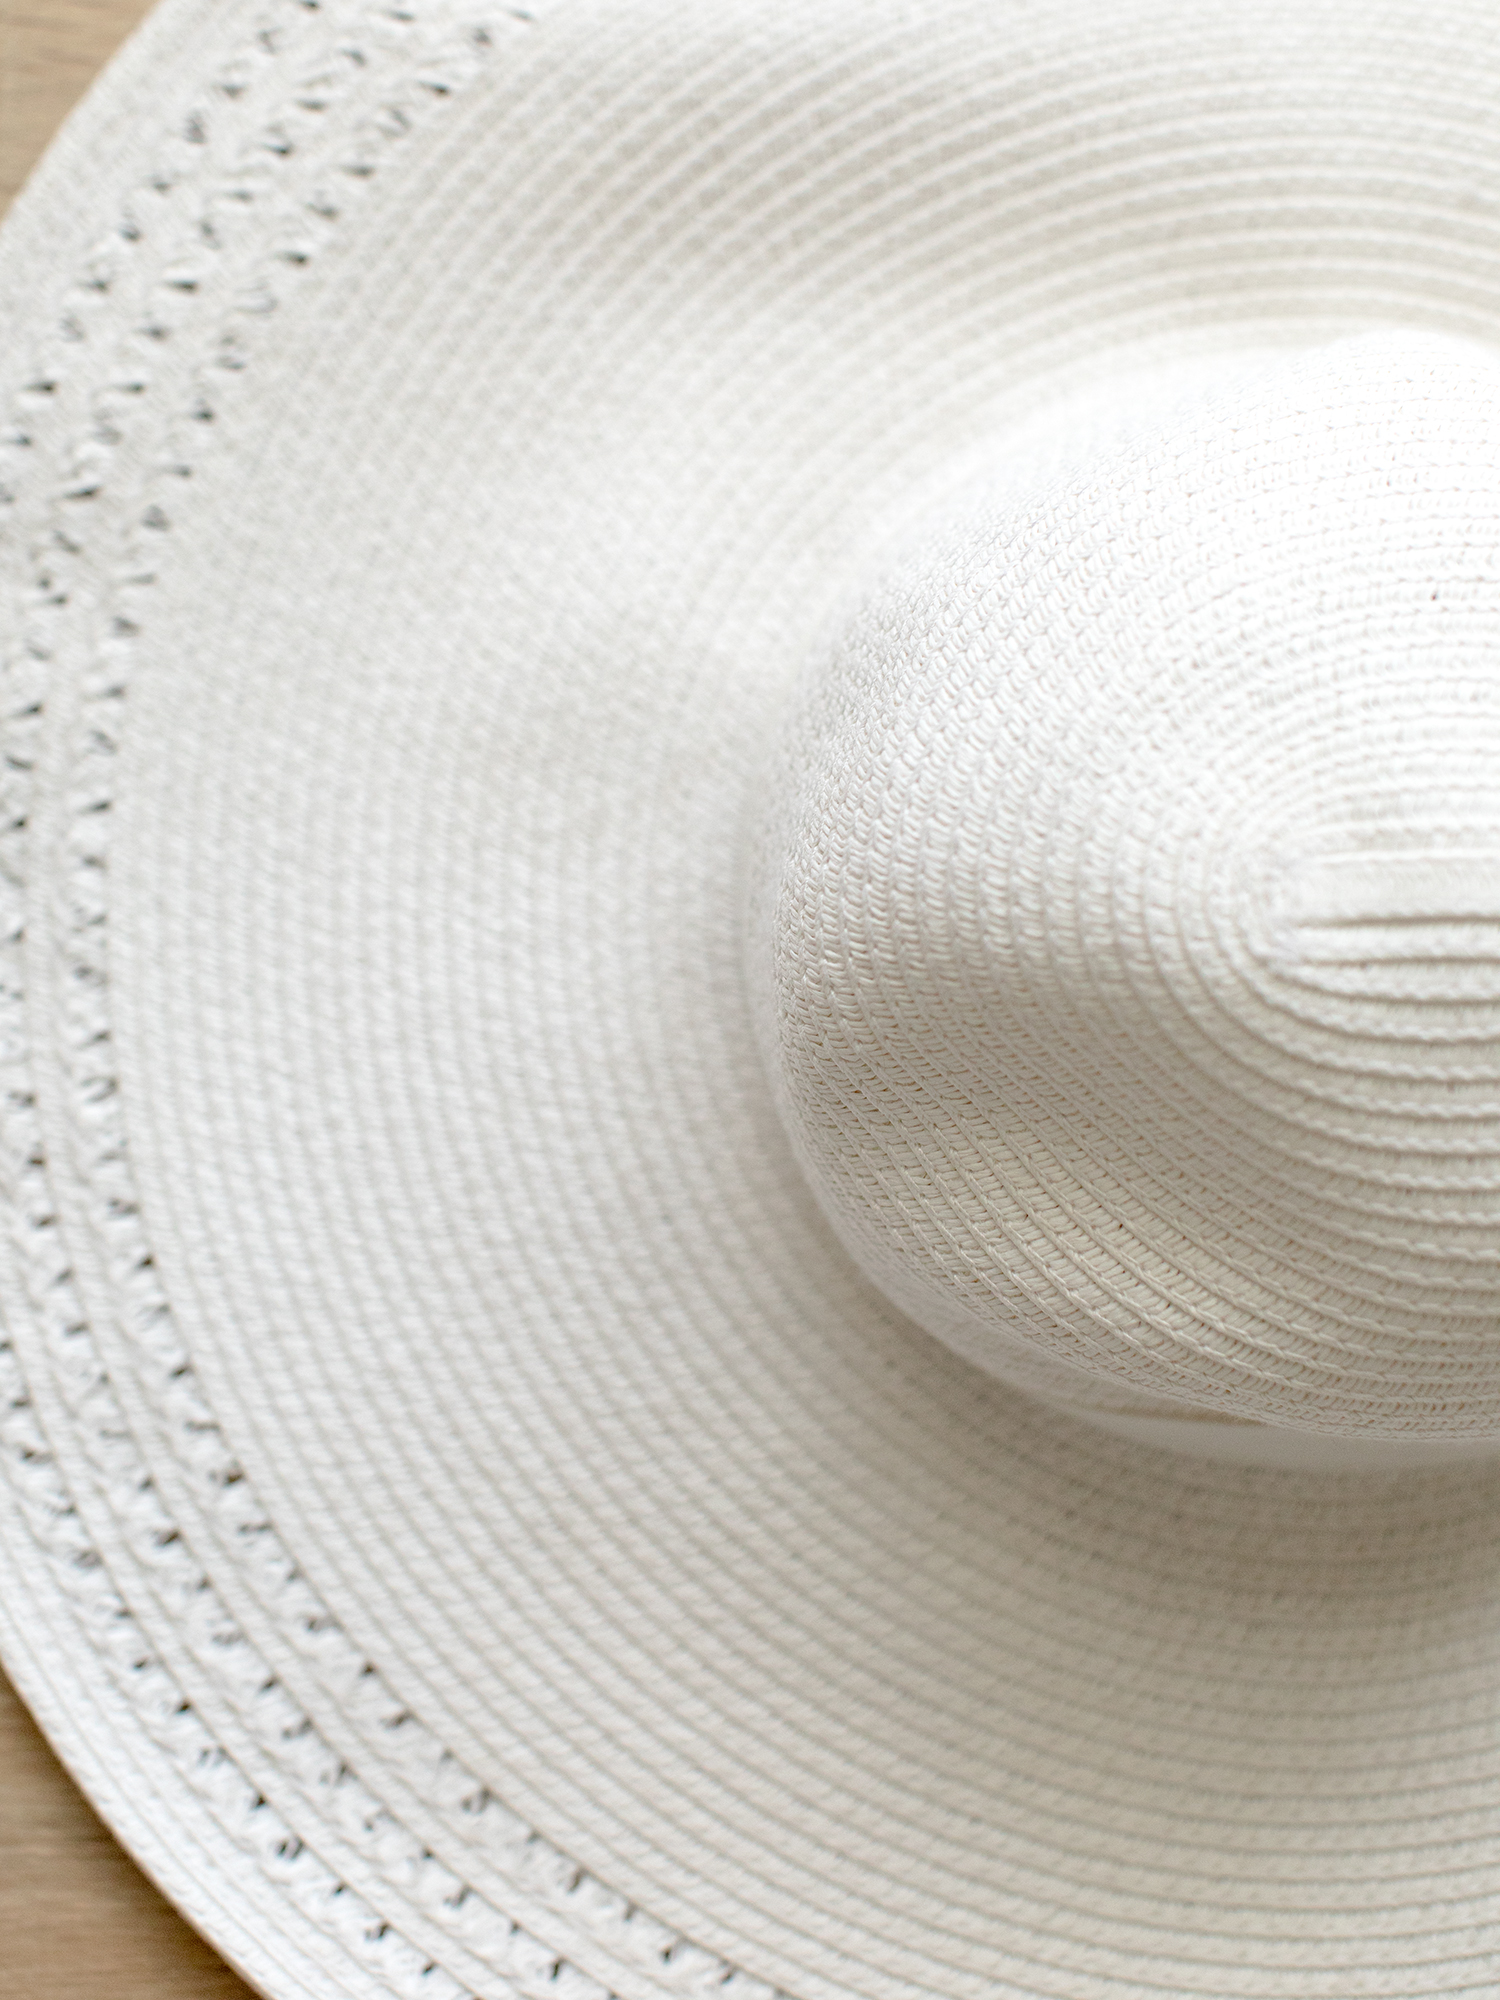 melissa+durrant+woven+hat